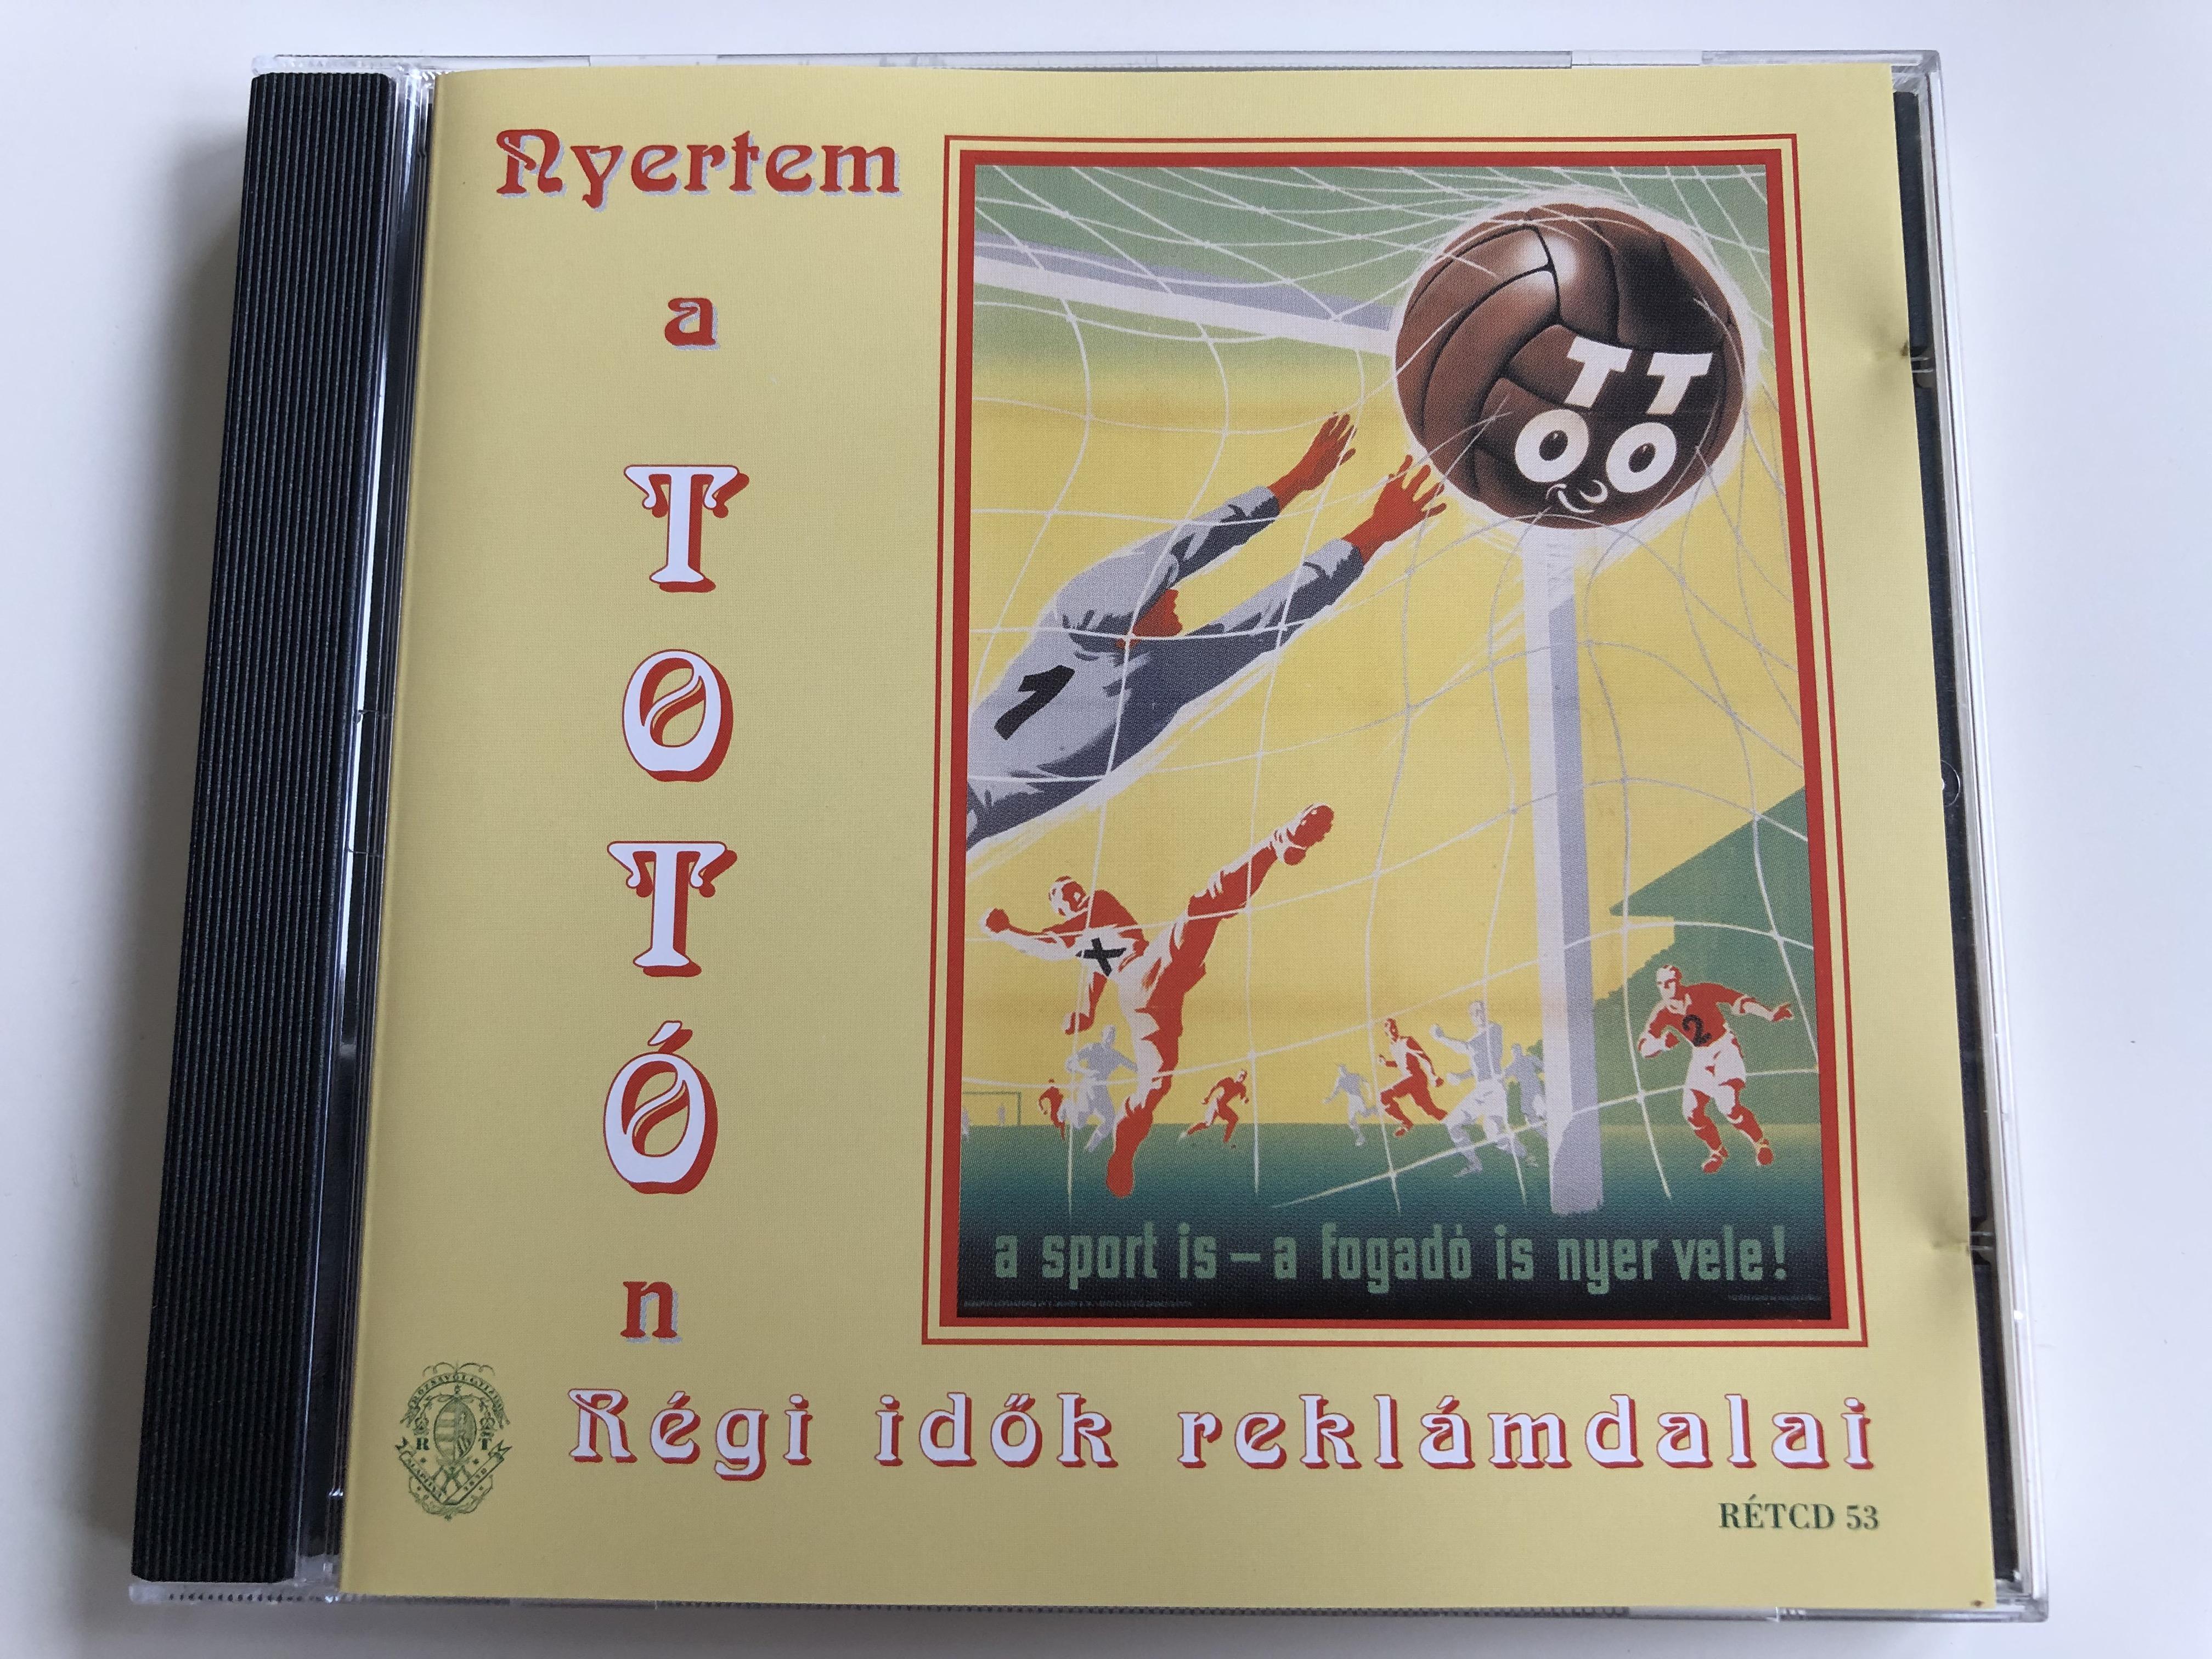 nyertem-a-tot-n-r-gi-id-k-rekl-mdalai-r-zsav-lgyi-s-t-rsa-audio-cd-2007-mono-r-tcd-53-1-.jpg